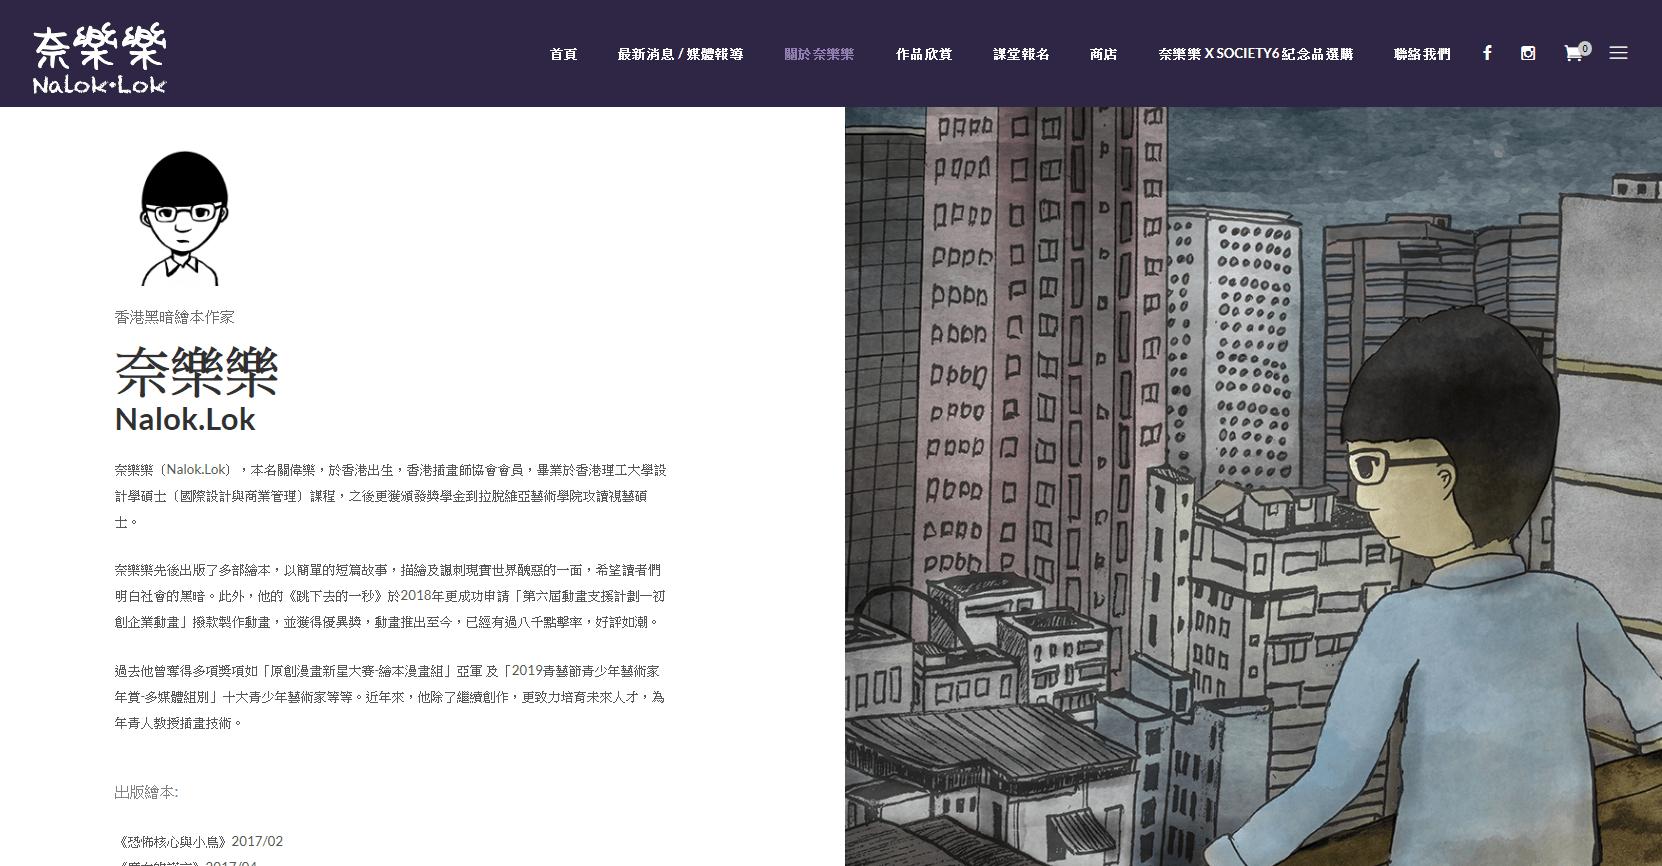 https://i0.wp.com/www.lokrazyplus.com/wp-content/uploads/2020/05/Screenshot_2020-05-21-奈樂樂官方網站-Nalok-Lok-World1.png?fit=1662%2C866&ssl=1